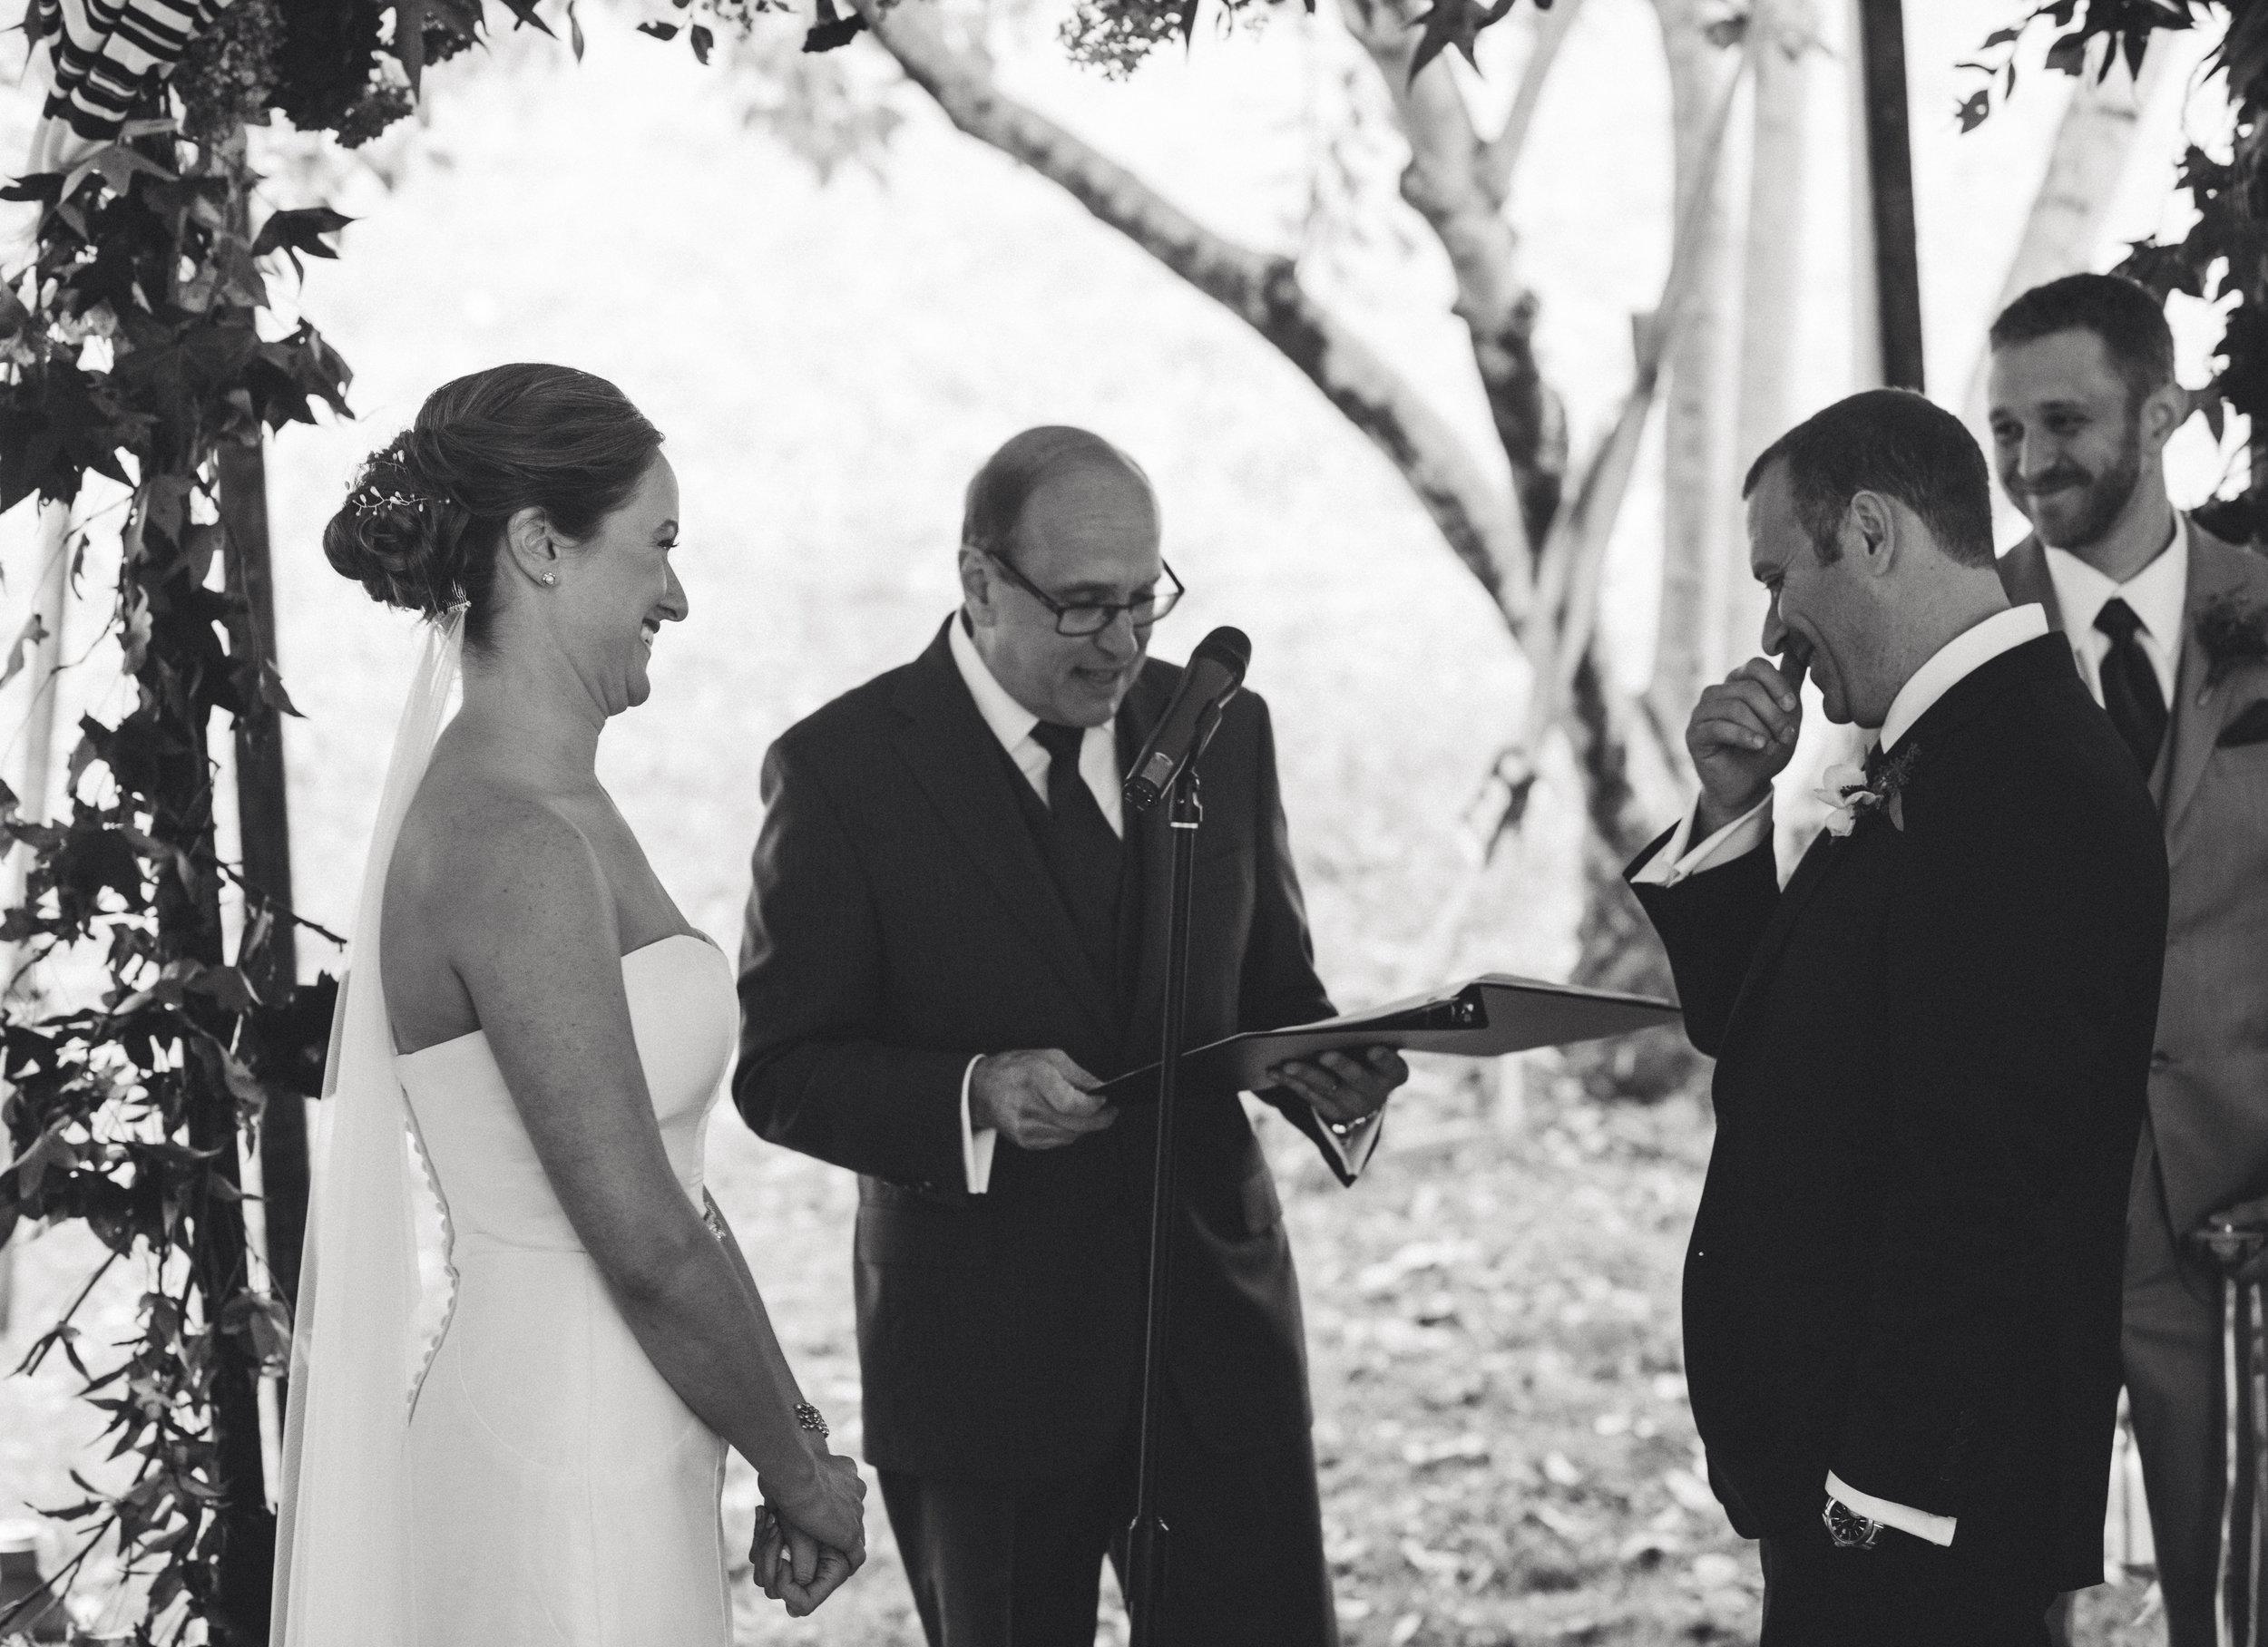 JACQUELINE & ANDREW WARSHAWER -BROOKMILL FARM FALL WEDDING - INTIMATE WEDDING PHOTOGRAPHER - TWOTWENTY by CHI-CHI AGBIM-247.jpg